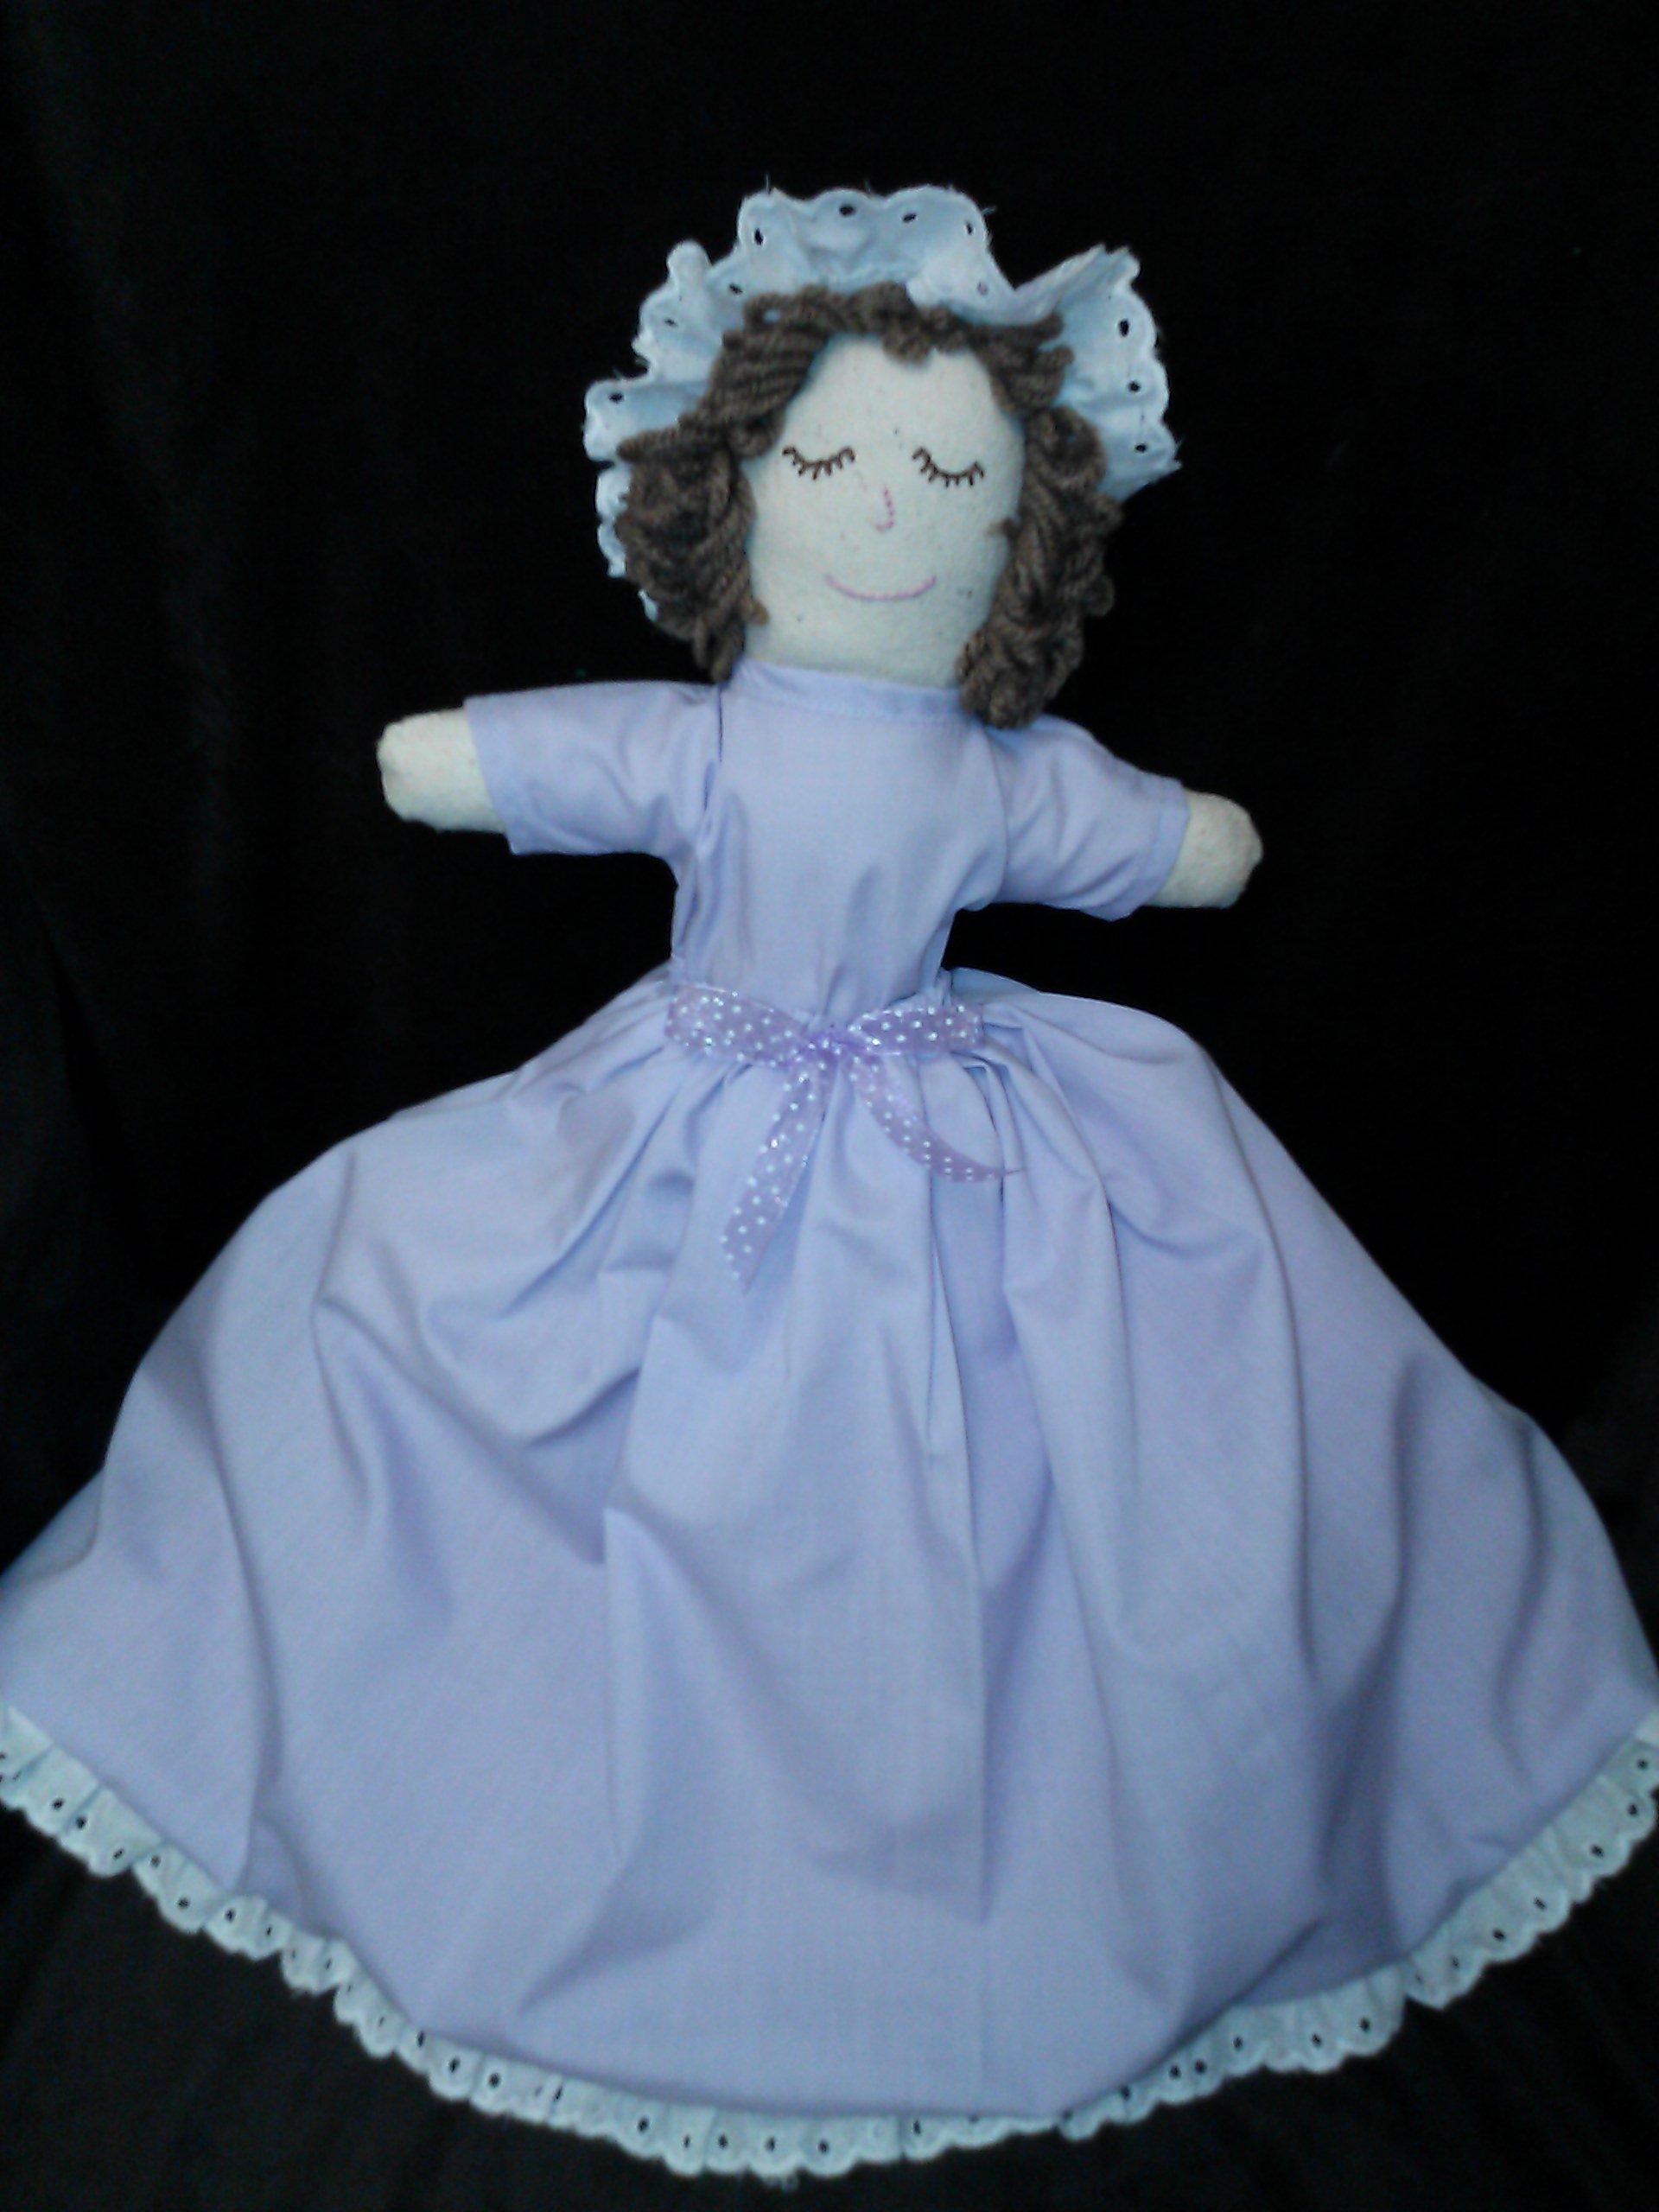 Bedtime Topsy Turvy Doll